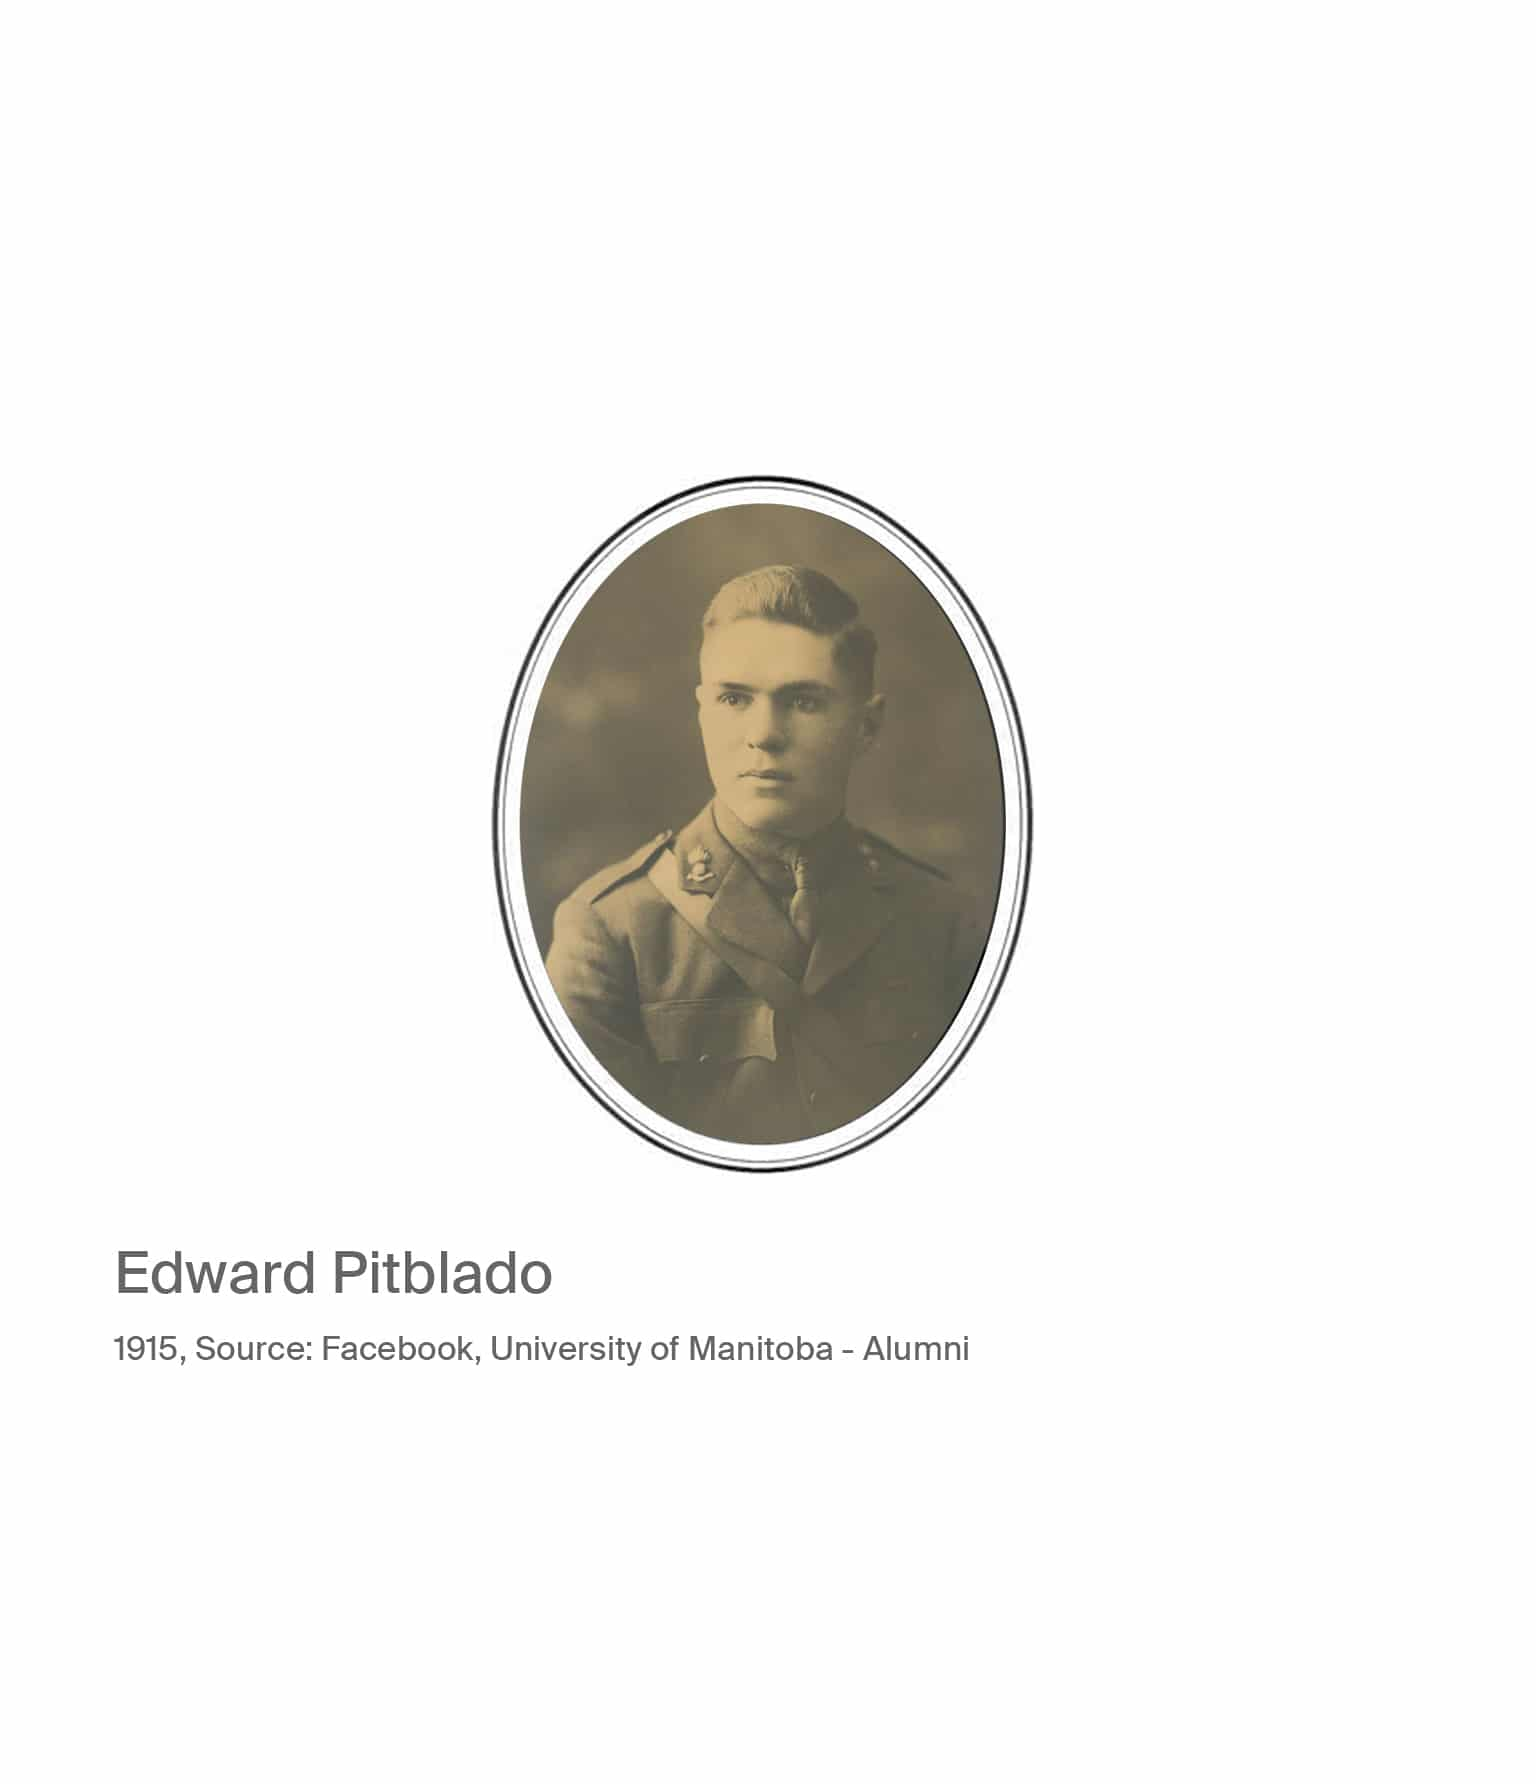 Edward Pitblado. 1915, source Facebook, University of Manitoba Alumni.